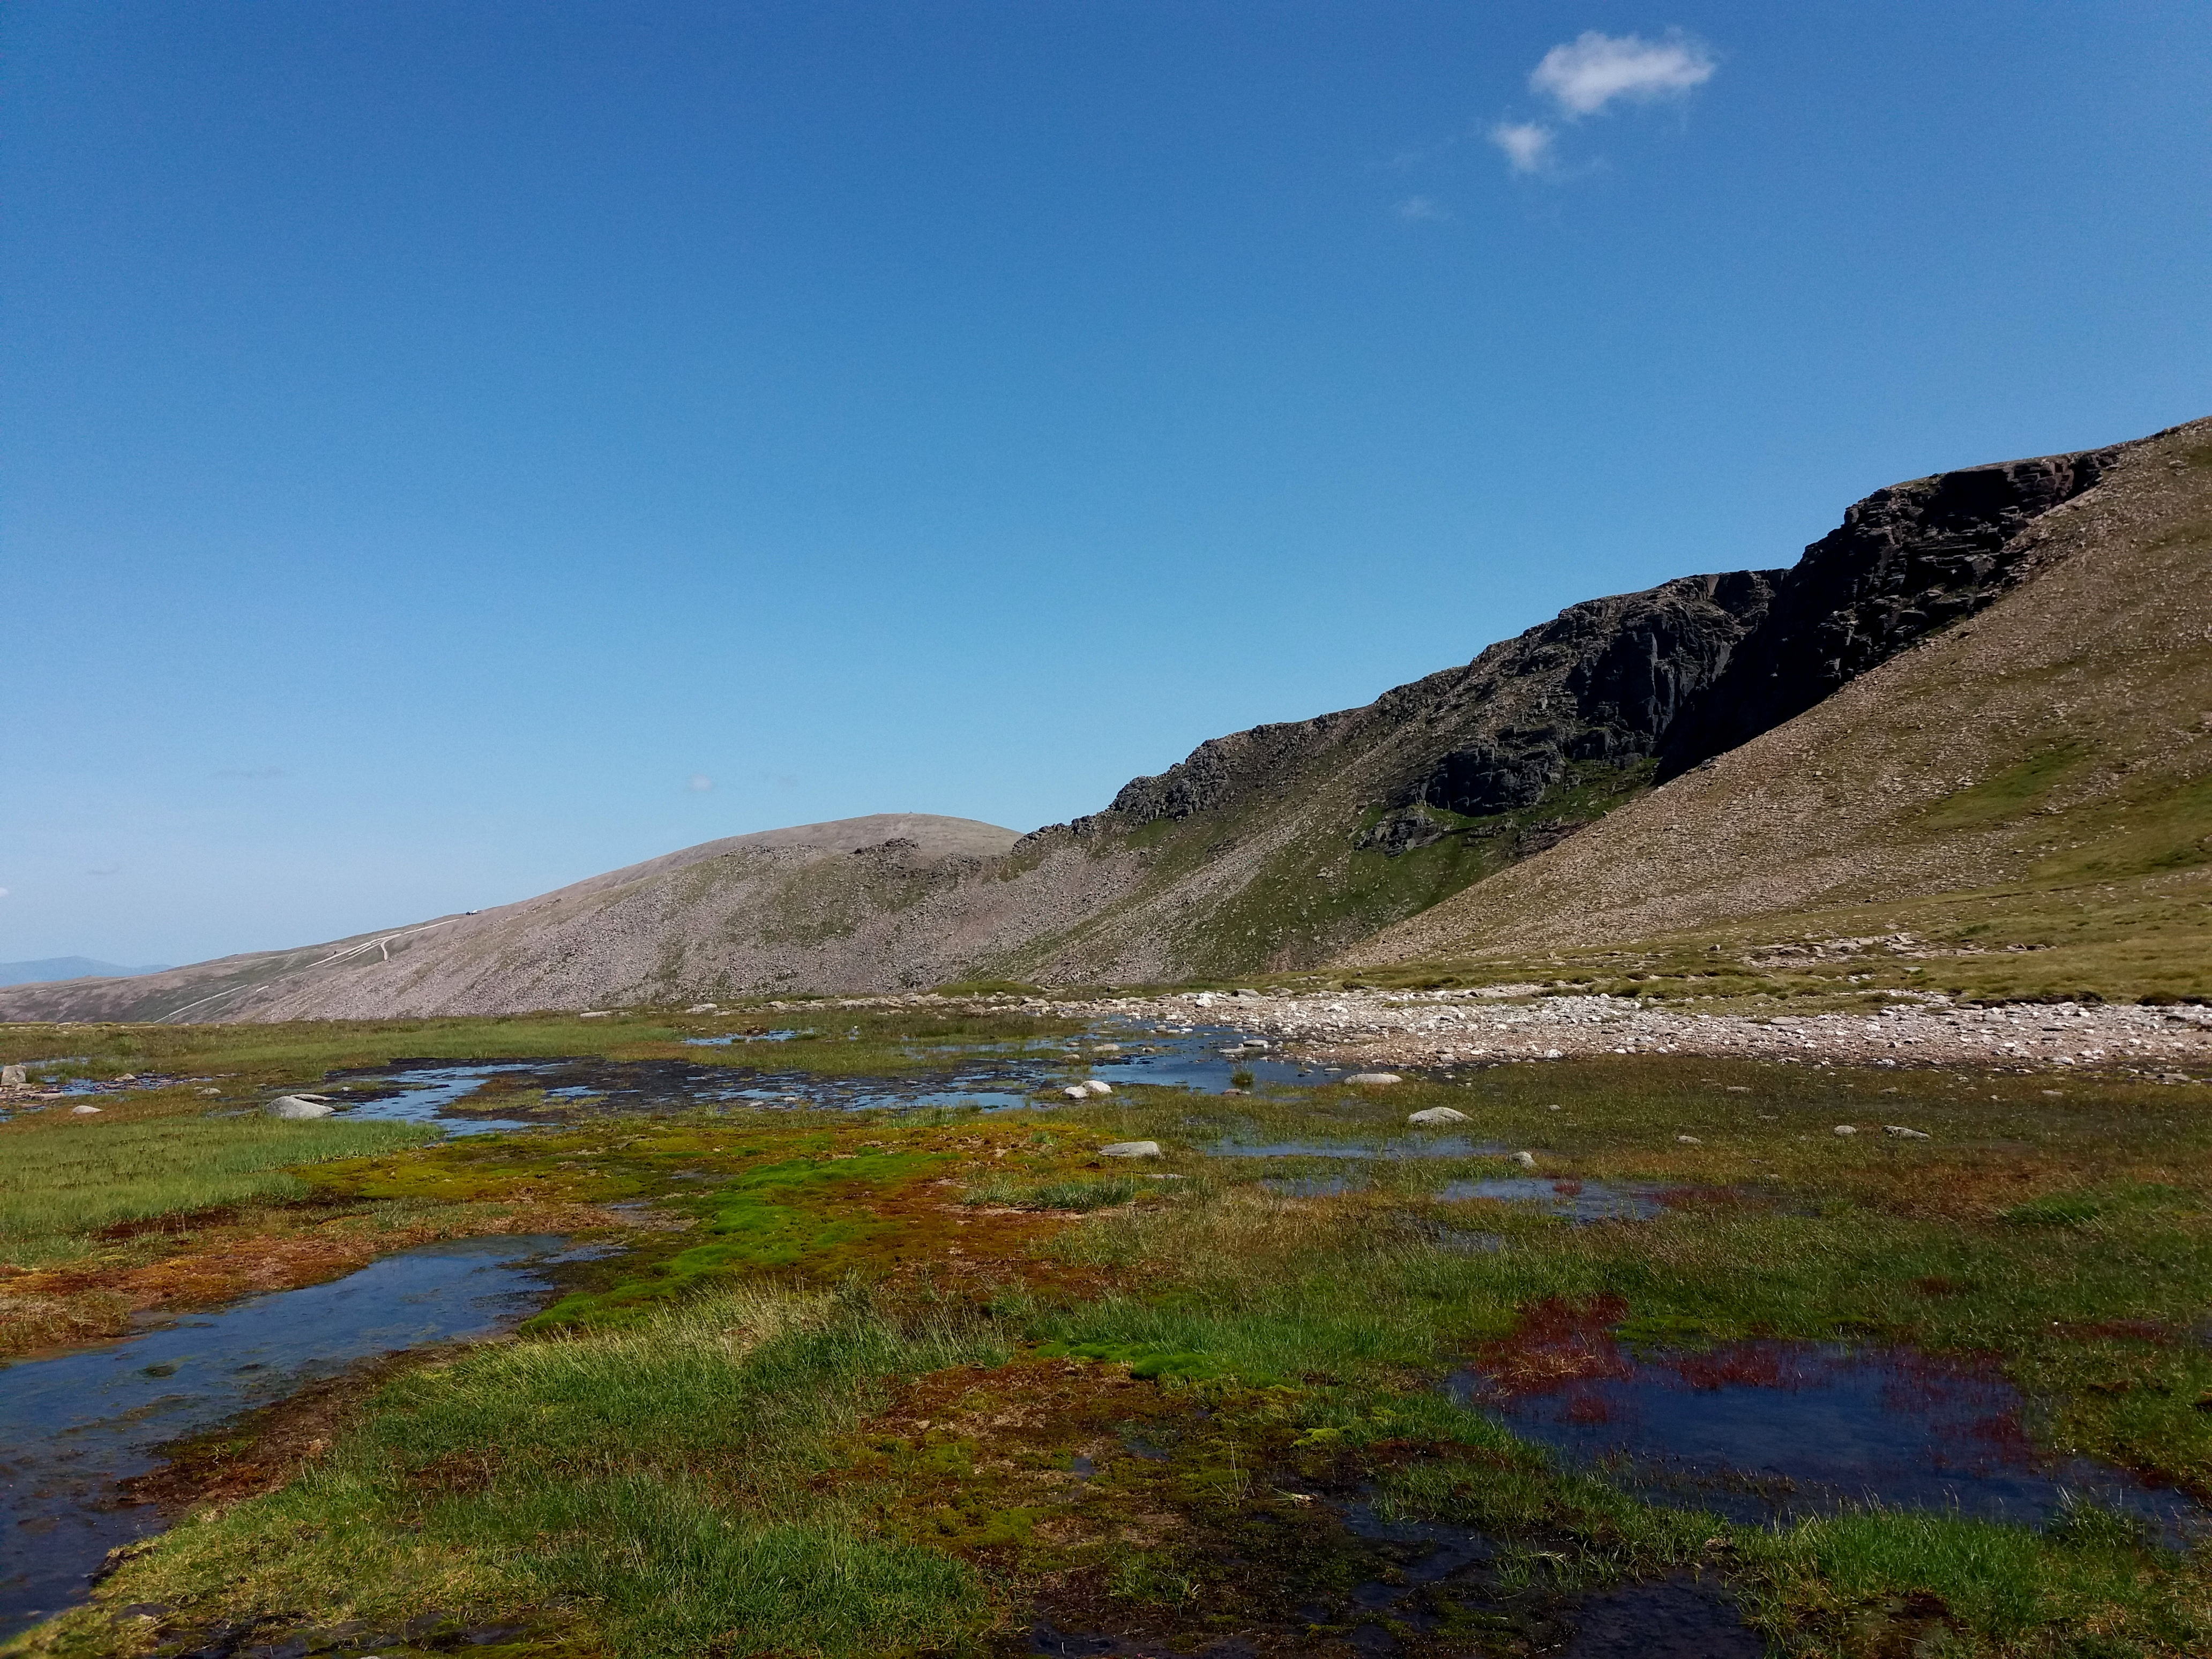 V NP Cairngorms